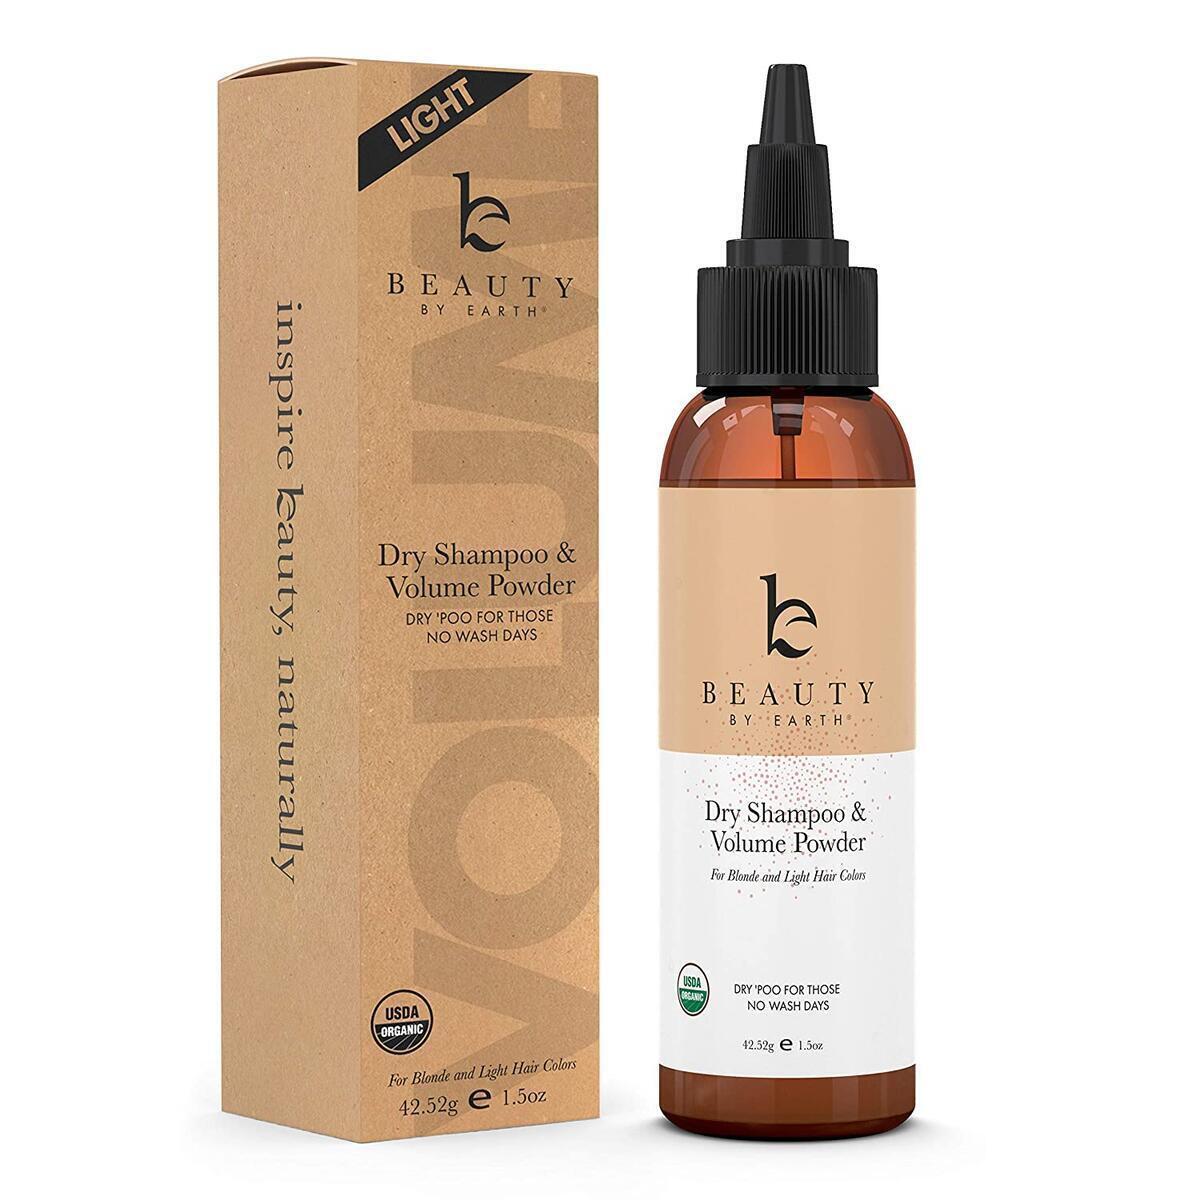 Dry Shampoo for Light Hair - Travel Size